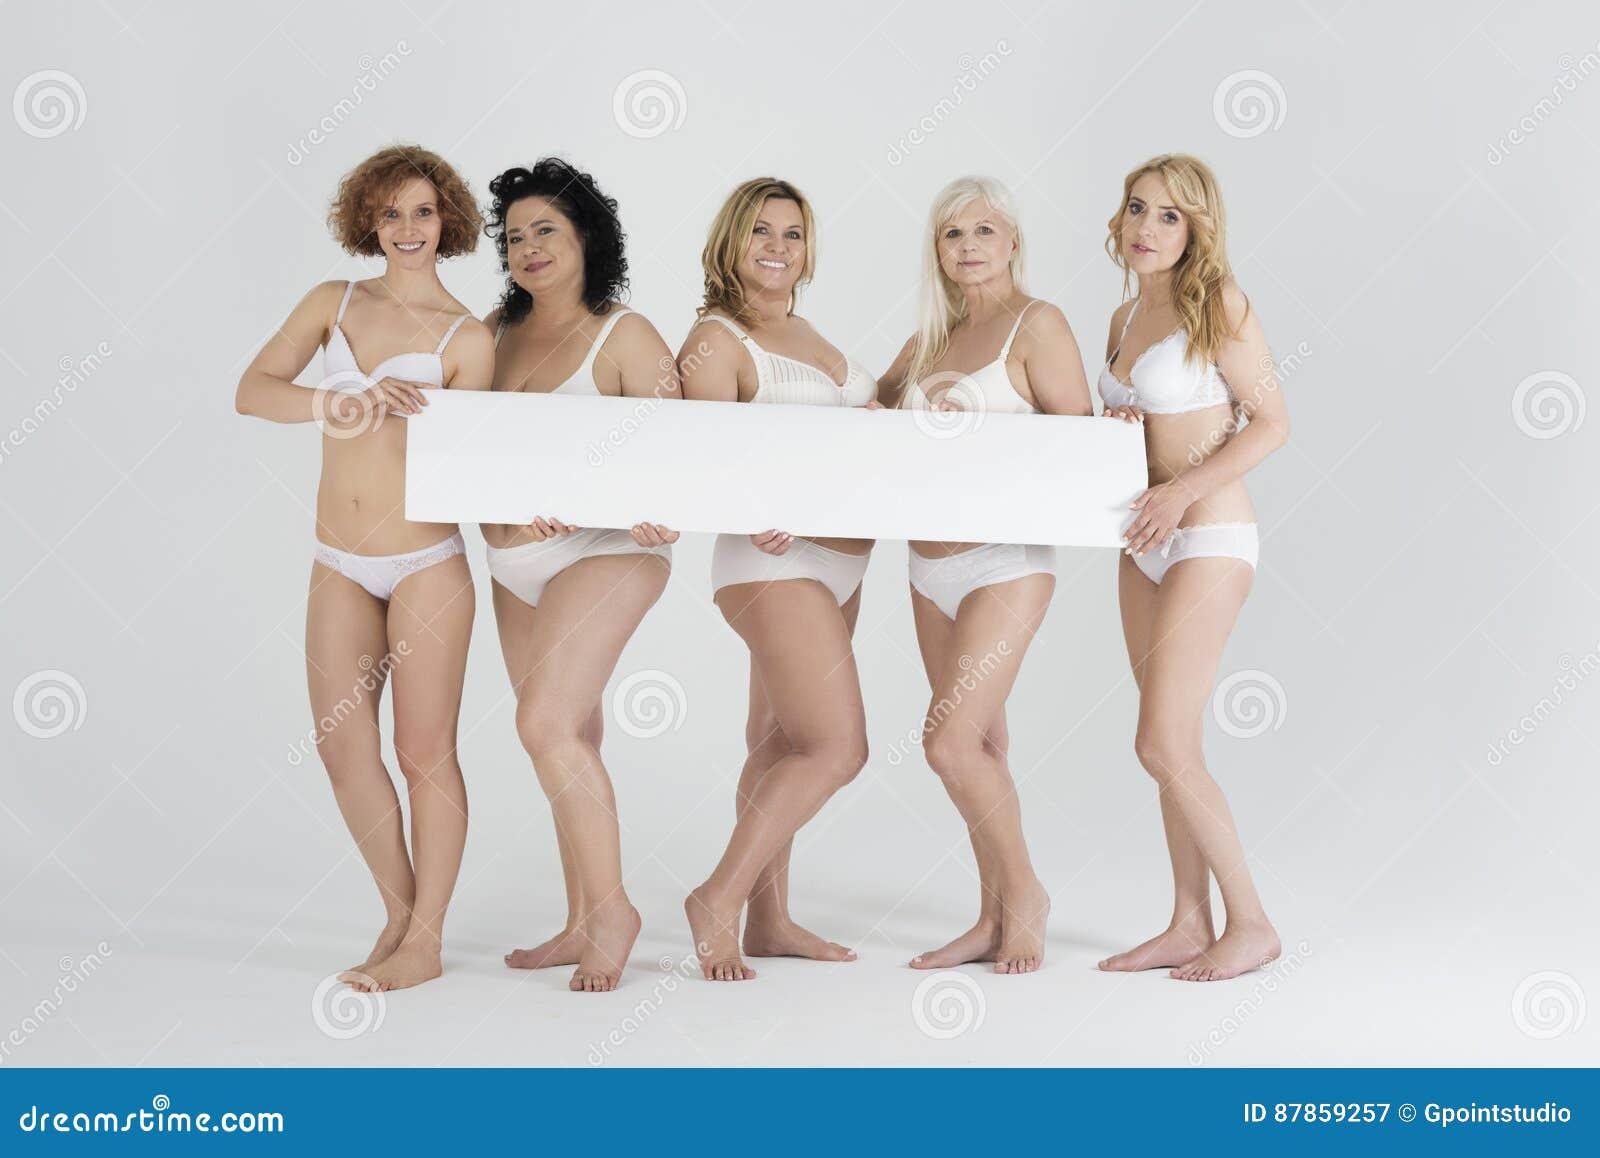 women in underwear stock image. image of body, bonding - 87859257